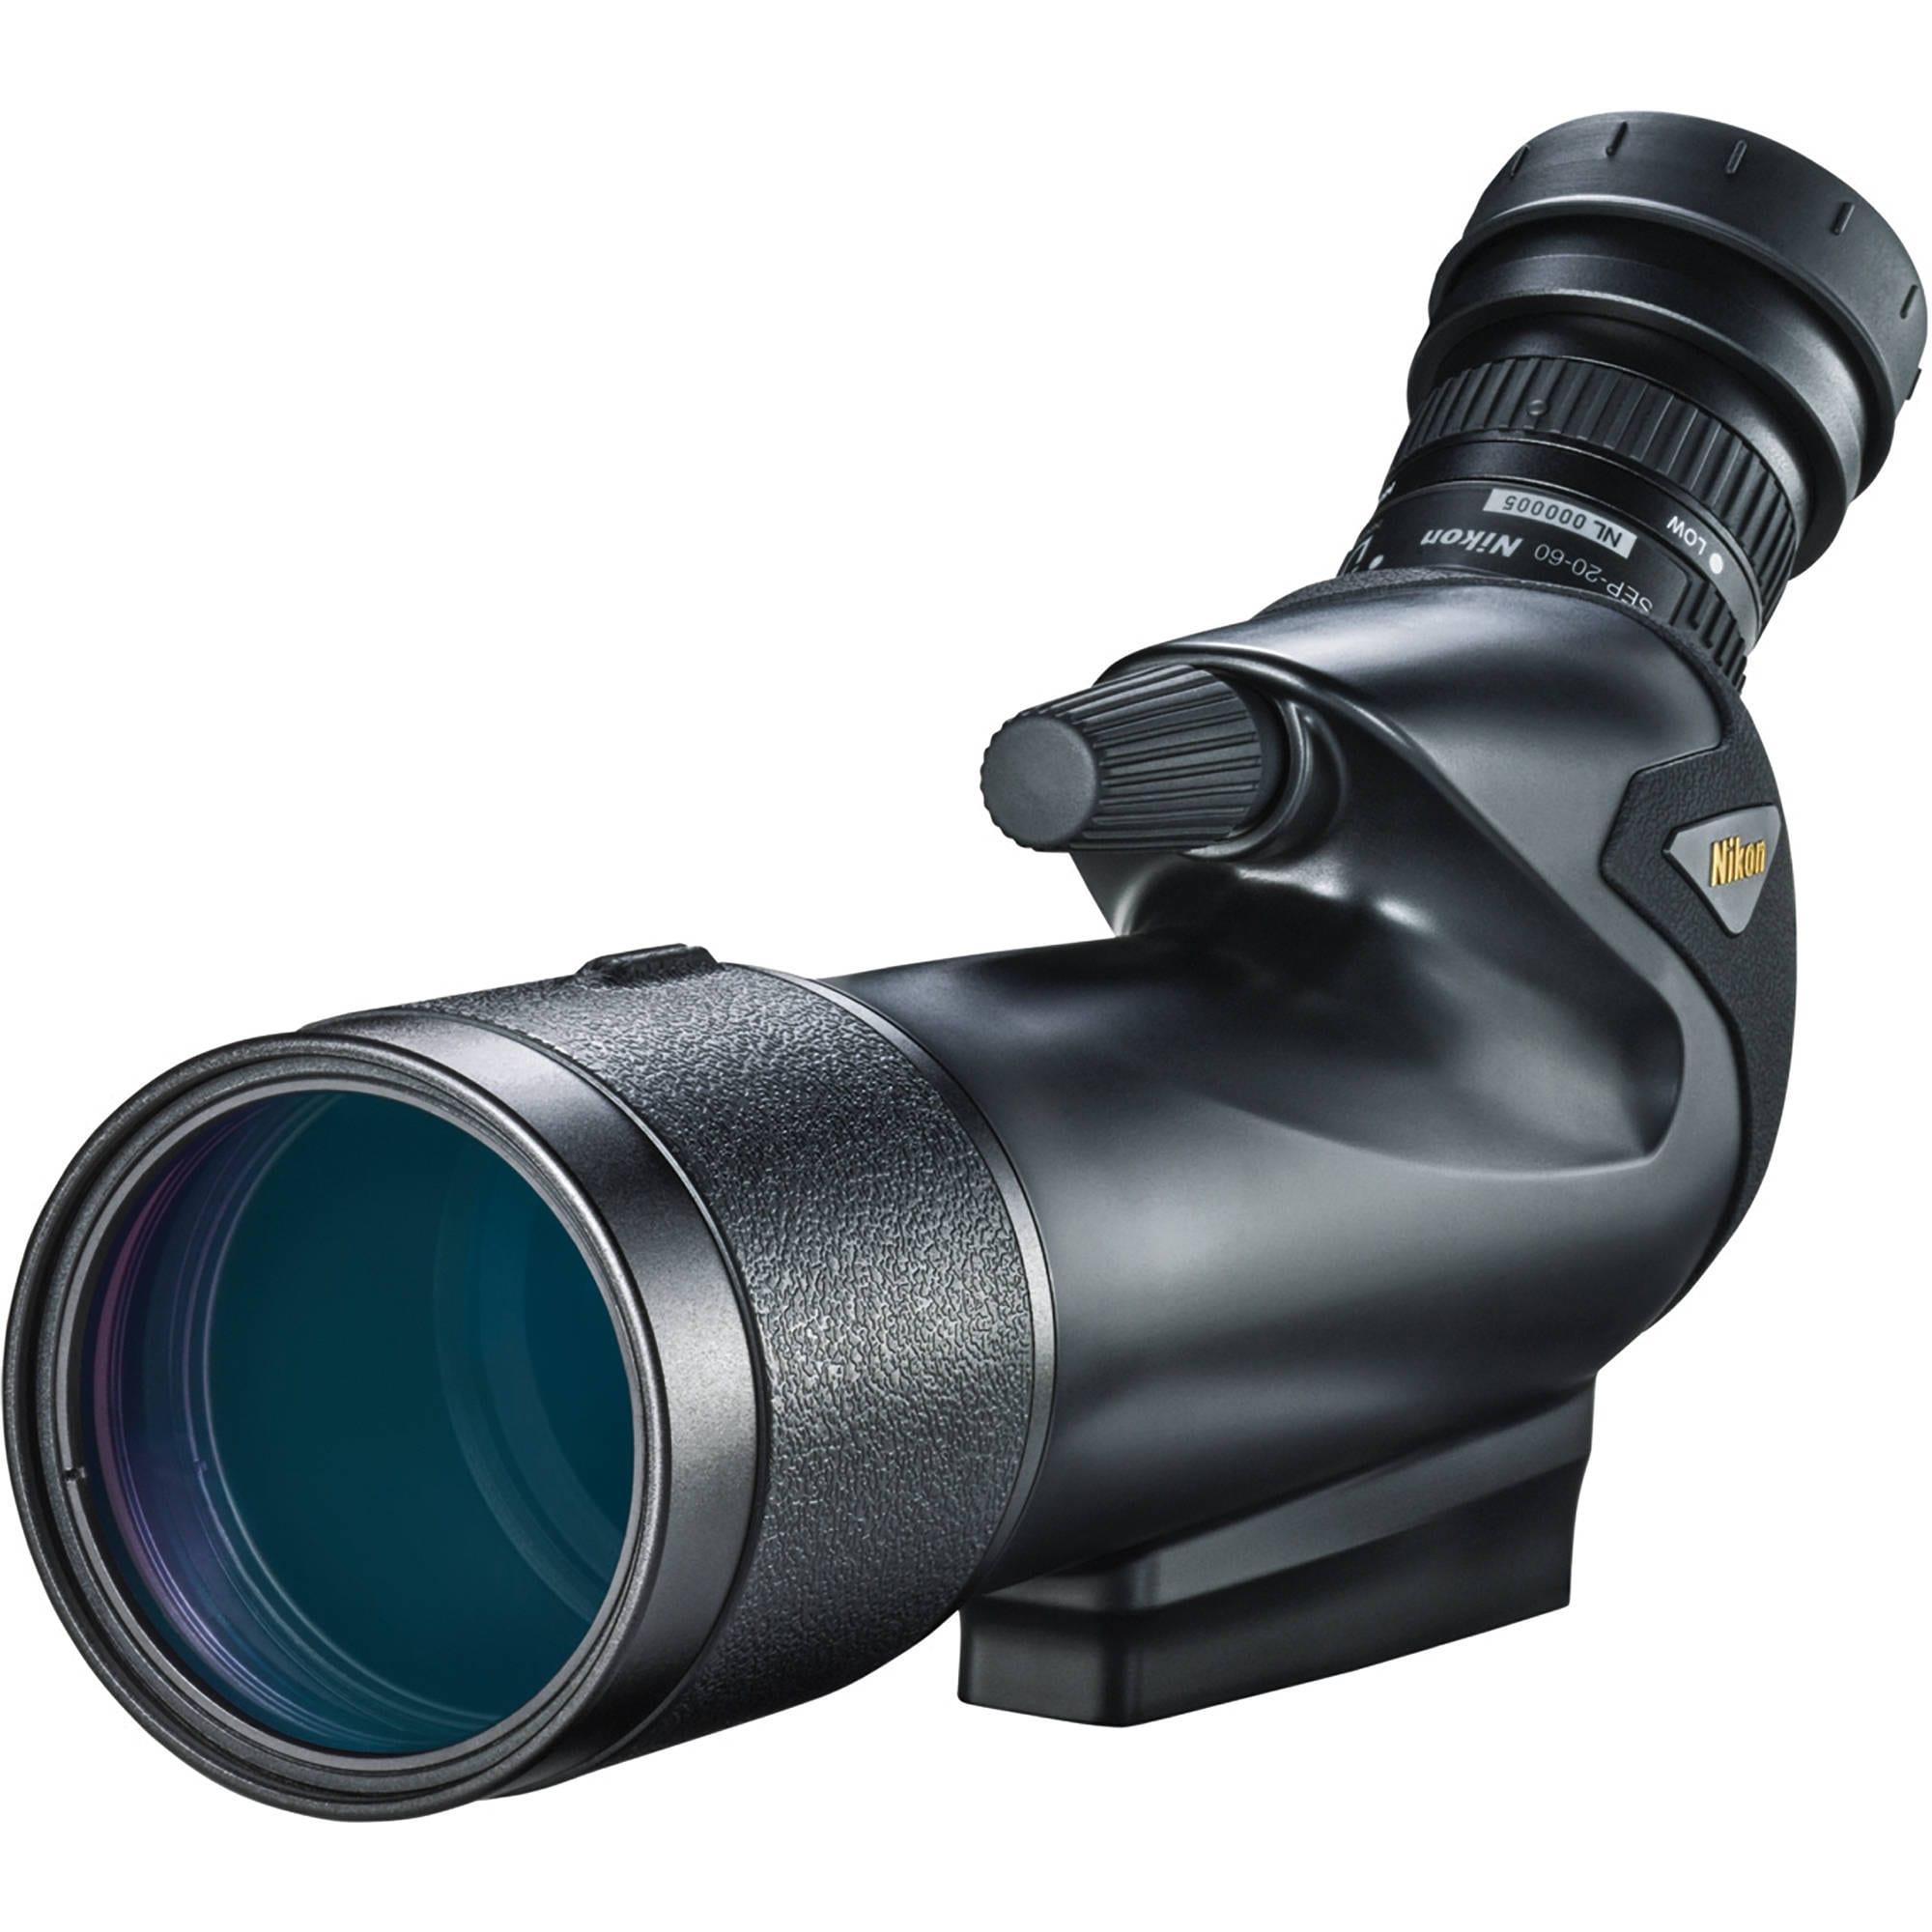 Nikon Prostaff 5 60 + 16-48x Okular